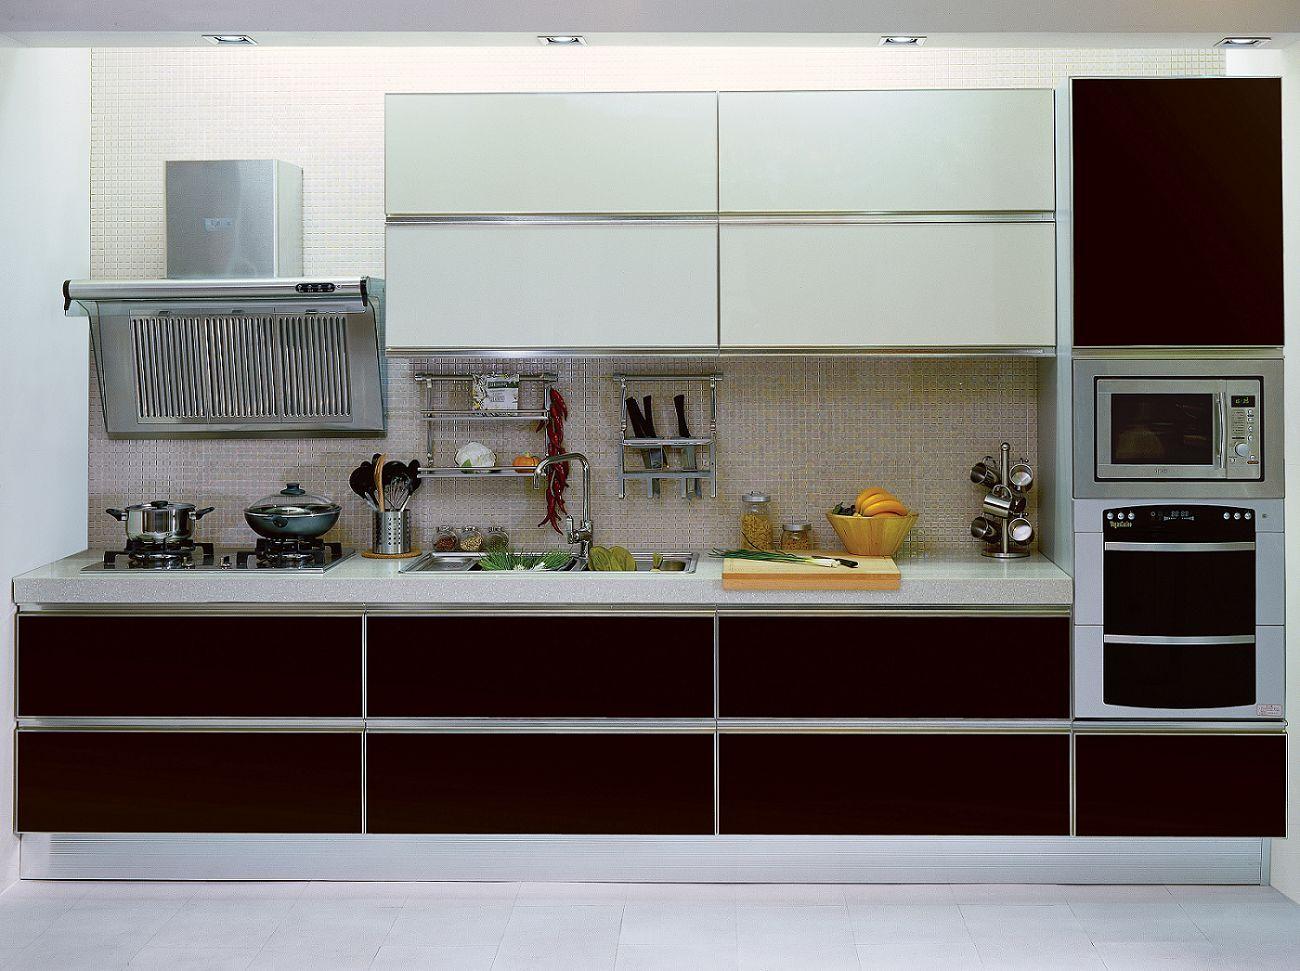 Best Kitchen Gallery: European Kitchen Cabi China Cabi S Home Design Idea of Euro Kitchen Cabinets on cal-ite.com